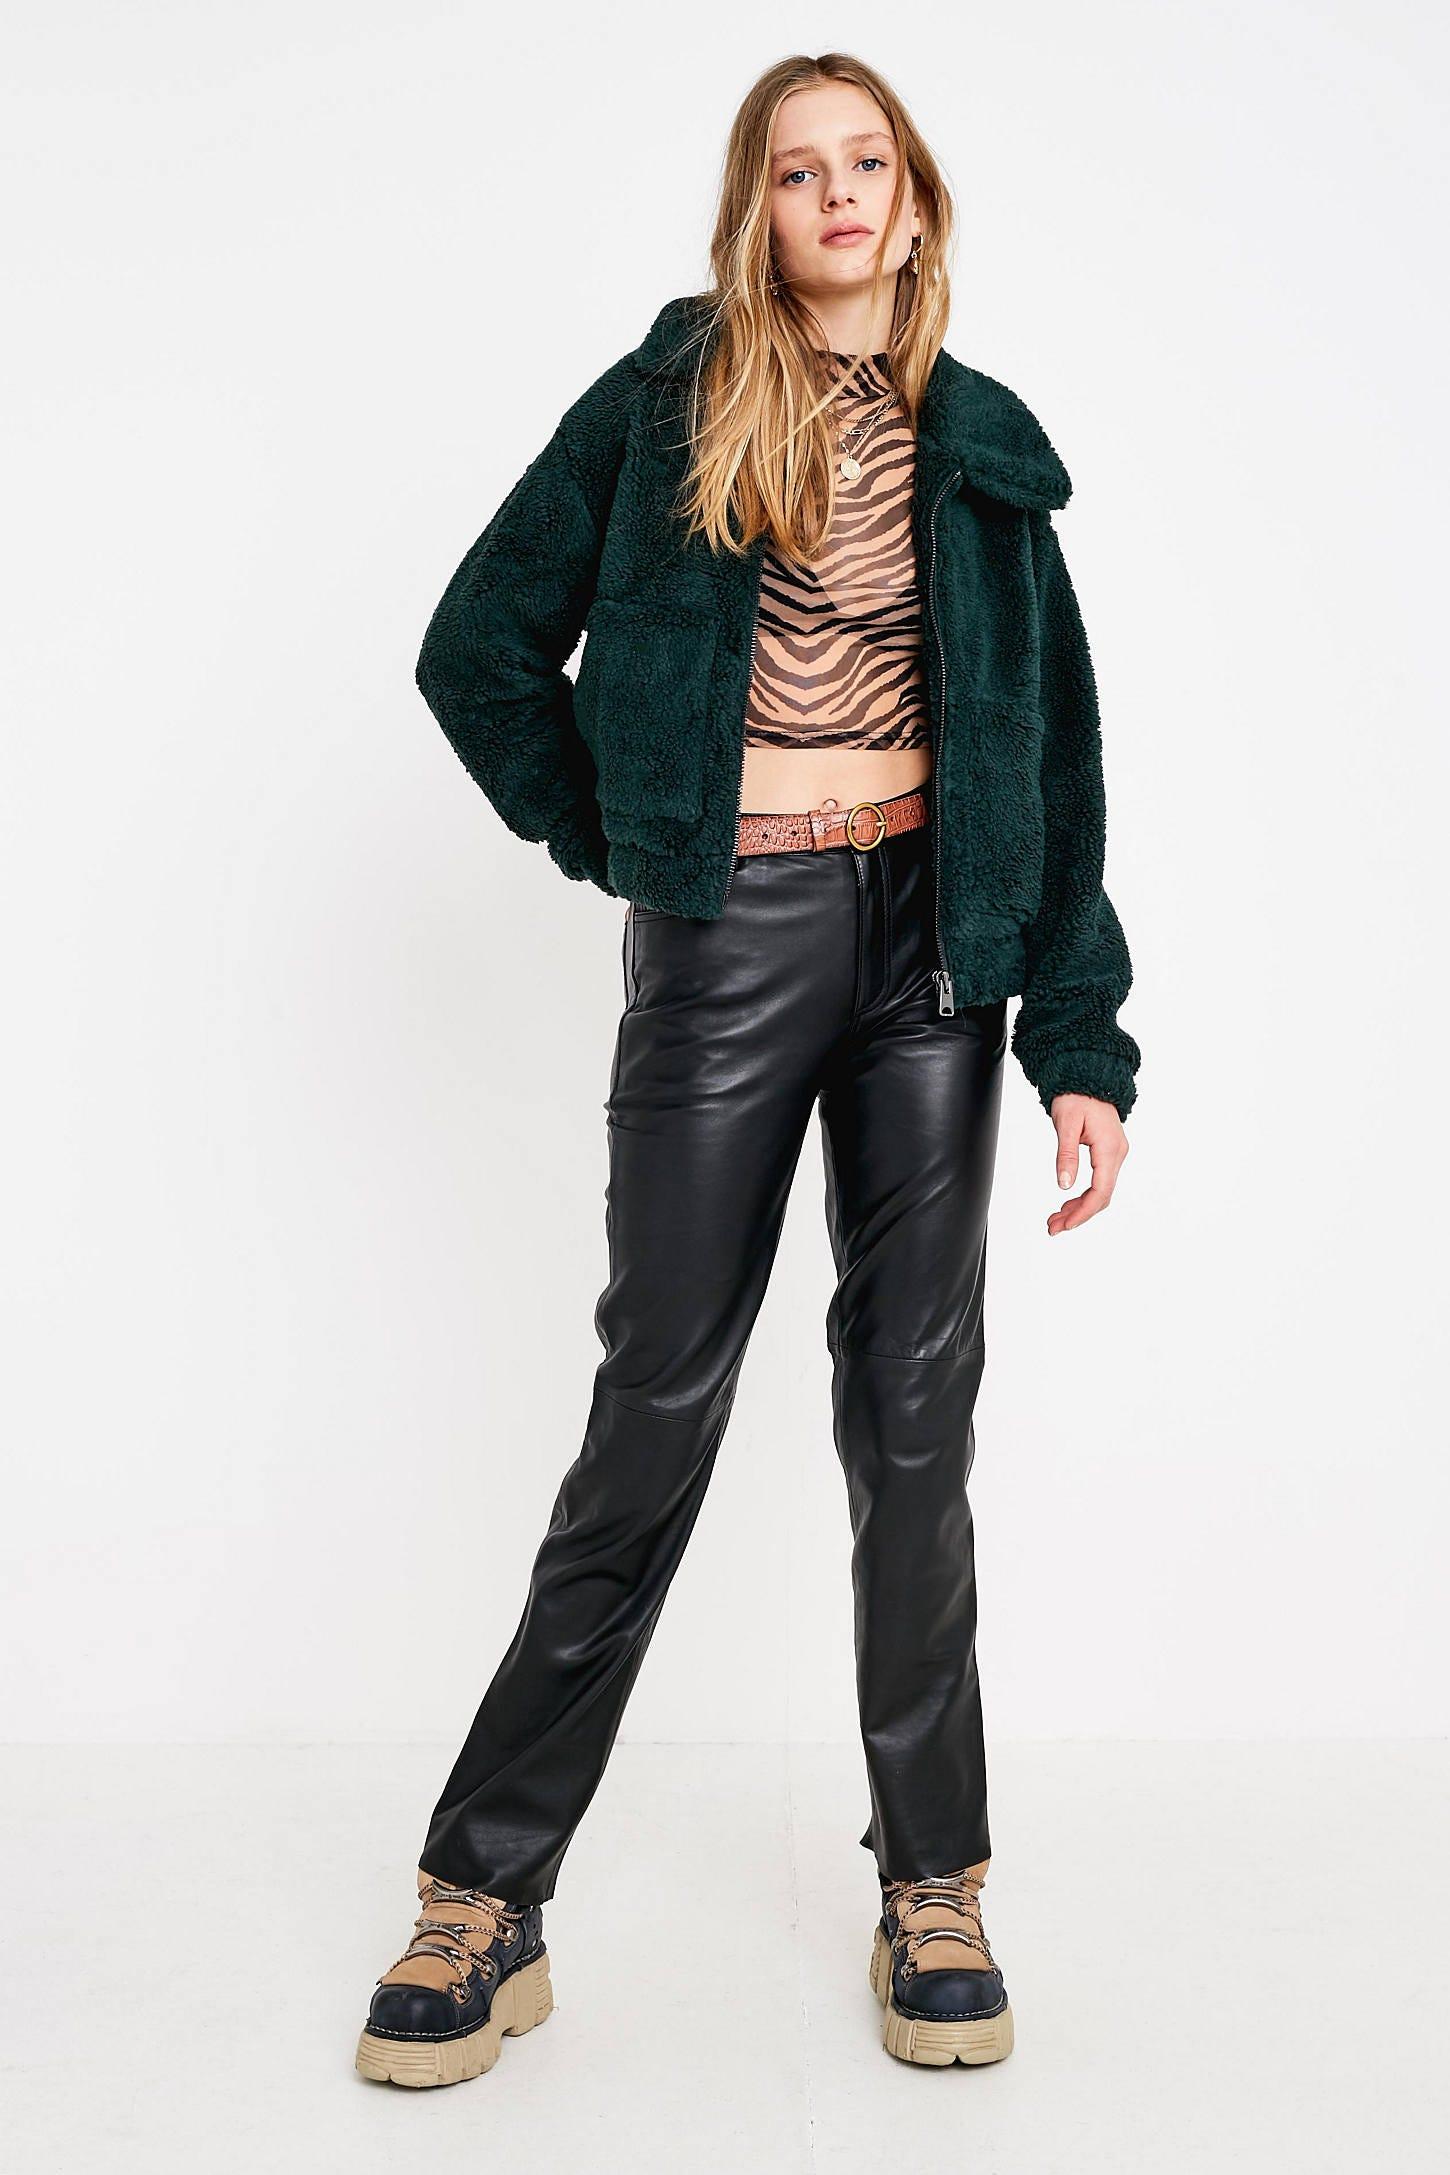 Uksexypornwomen Wwe Divas In Leather Pants